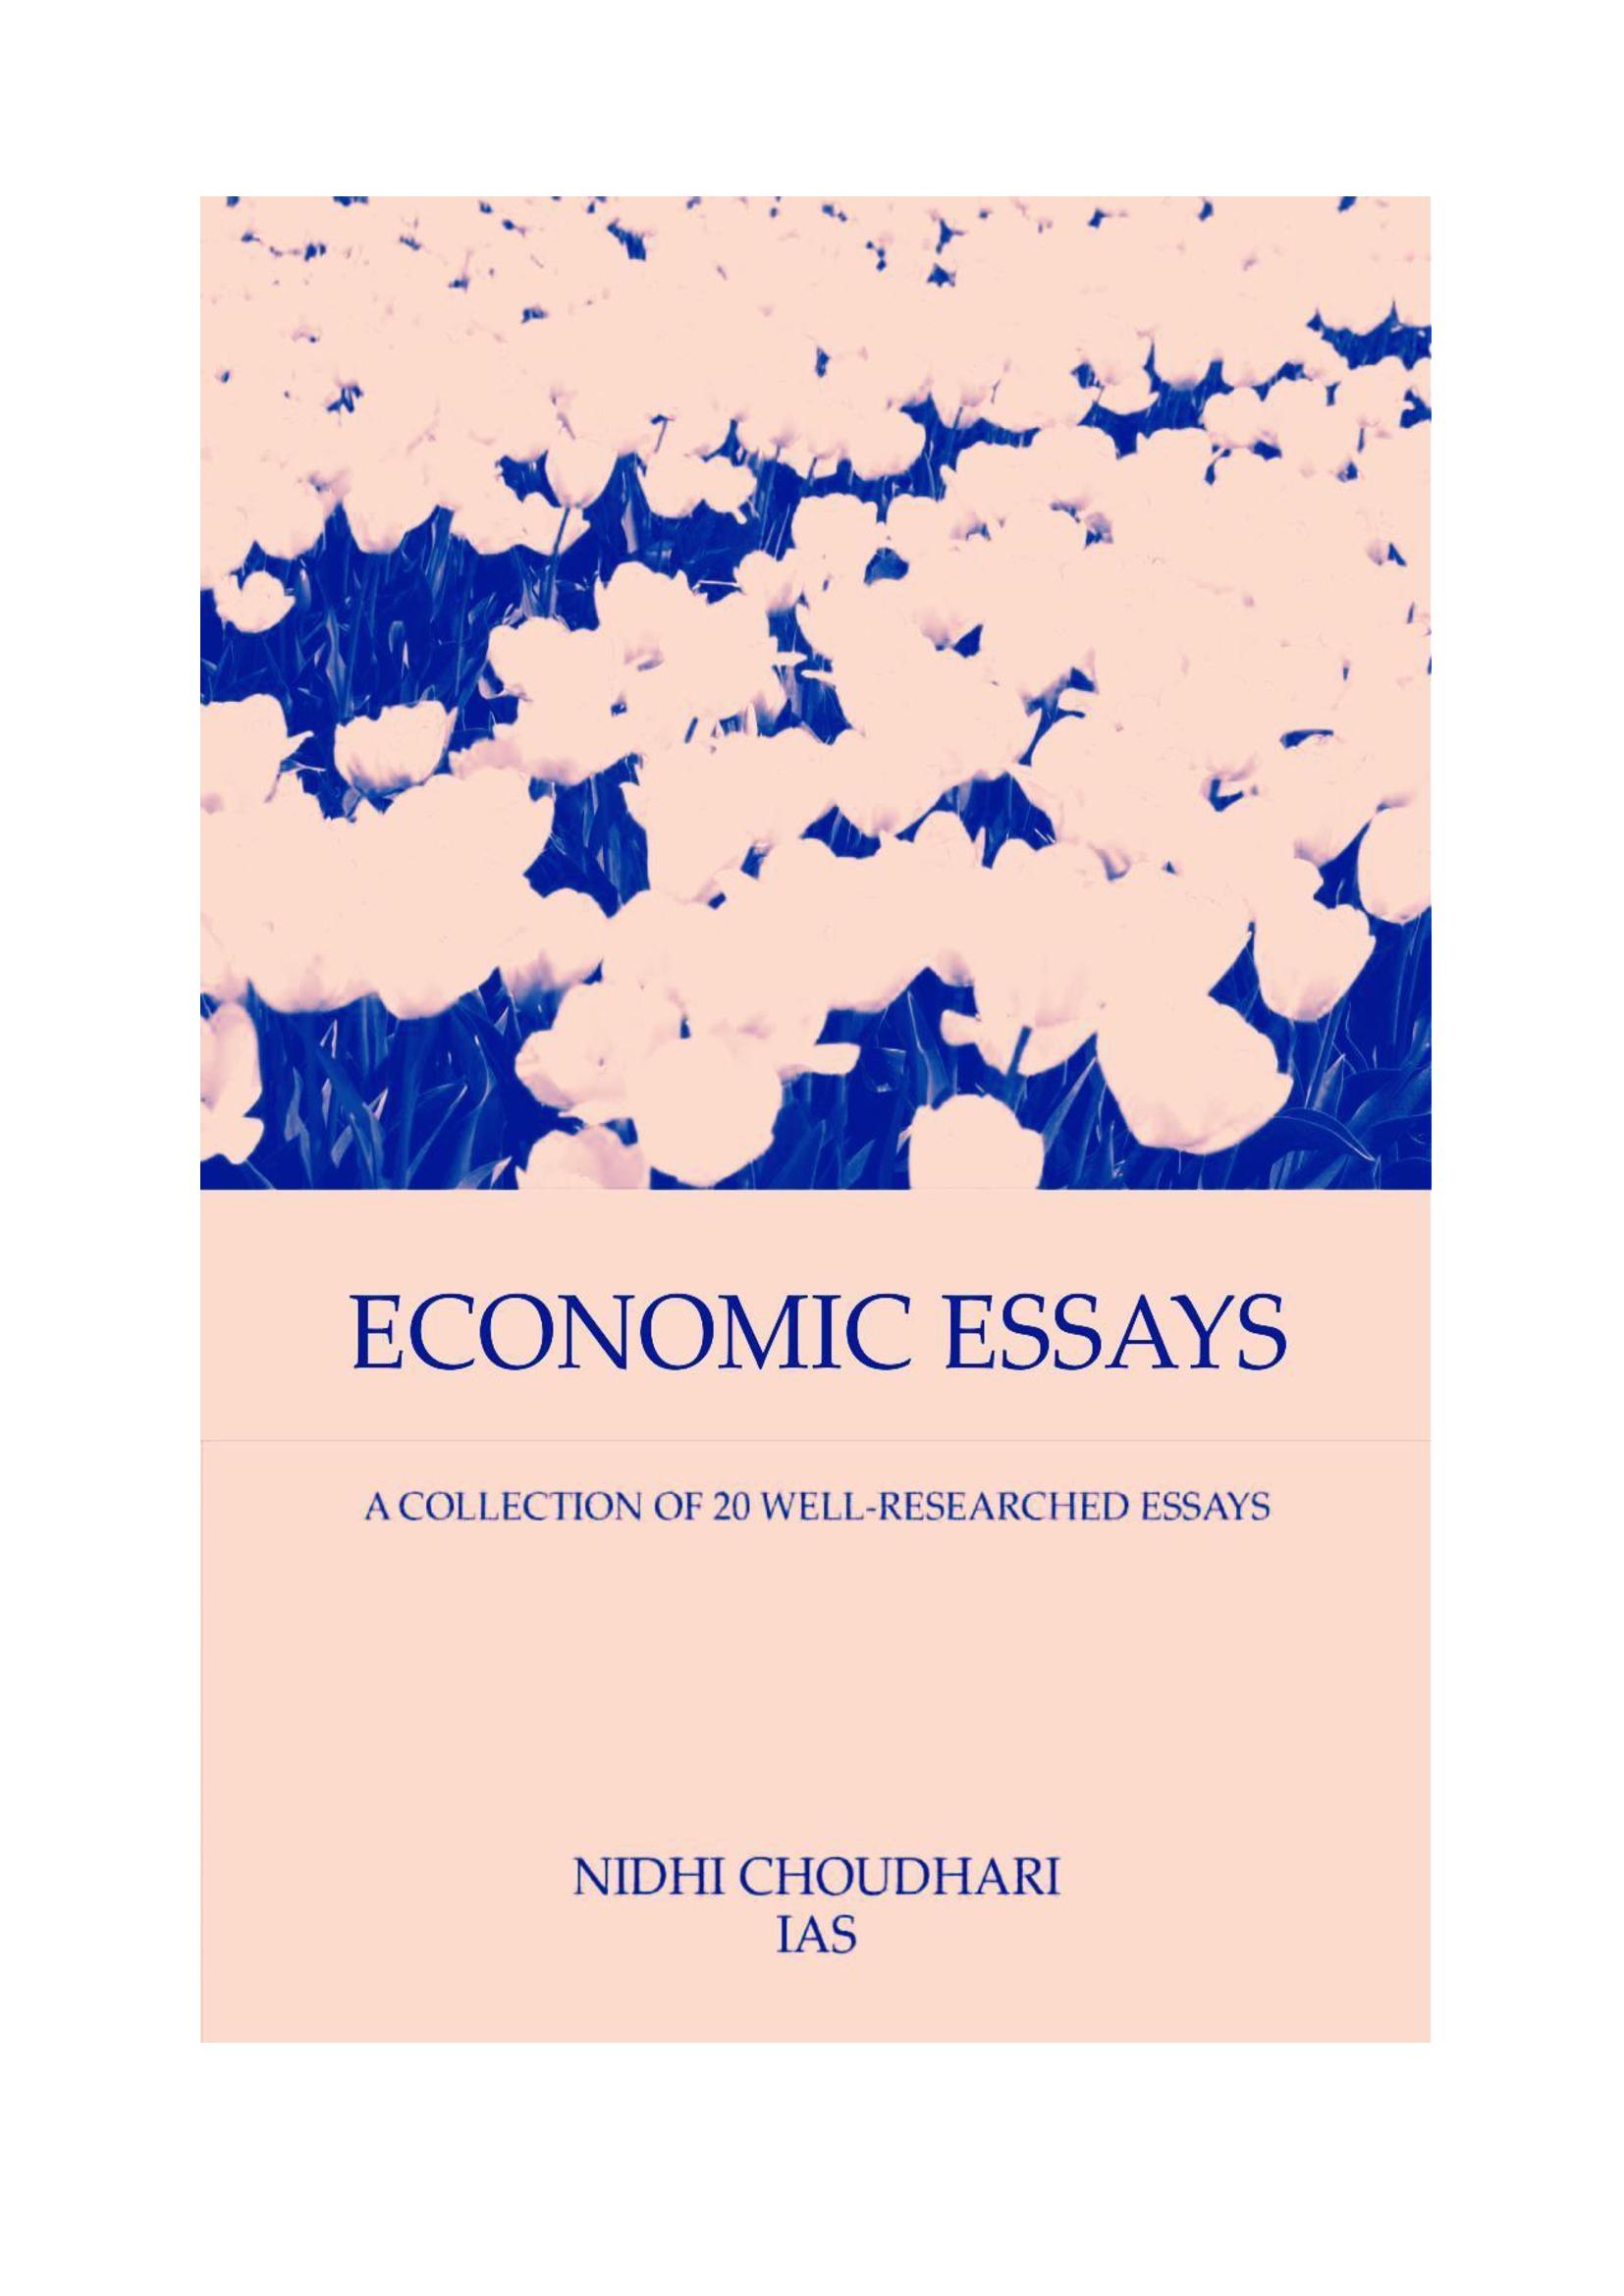 Essay on consumerism good or bad